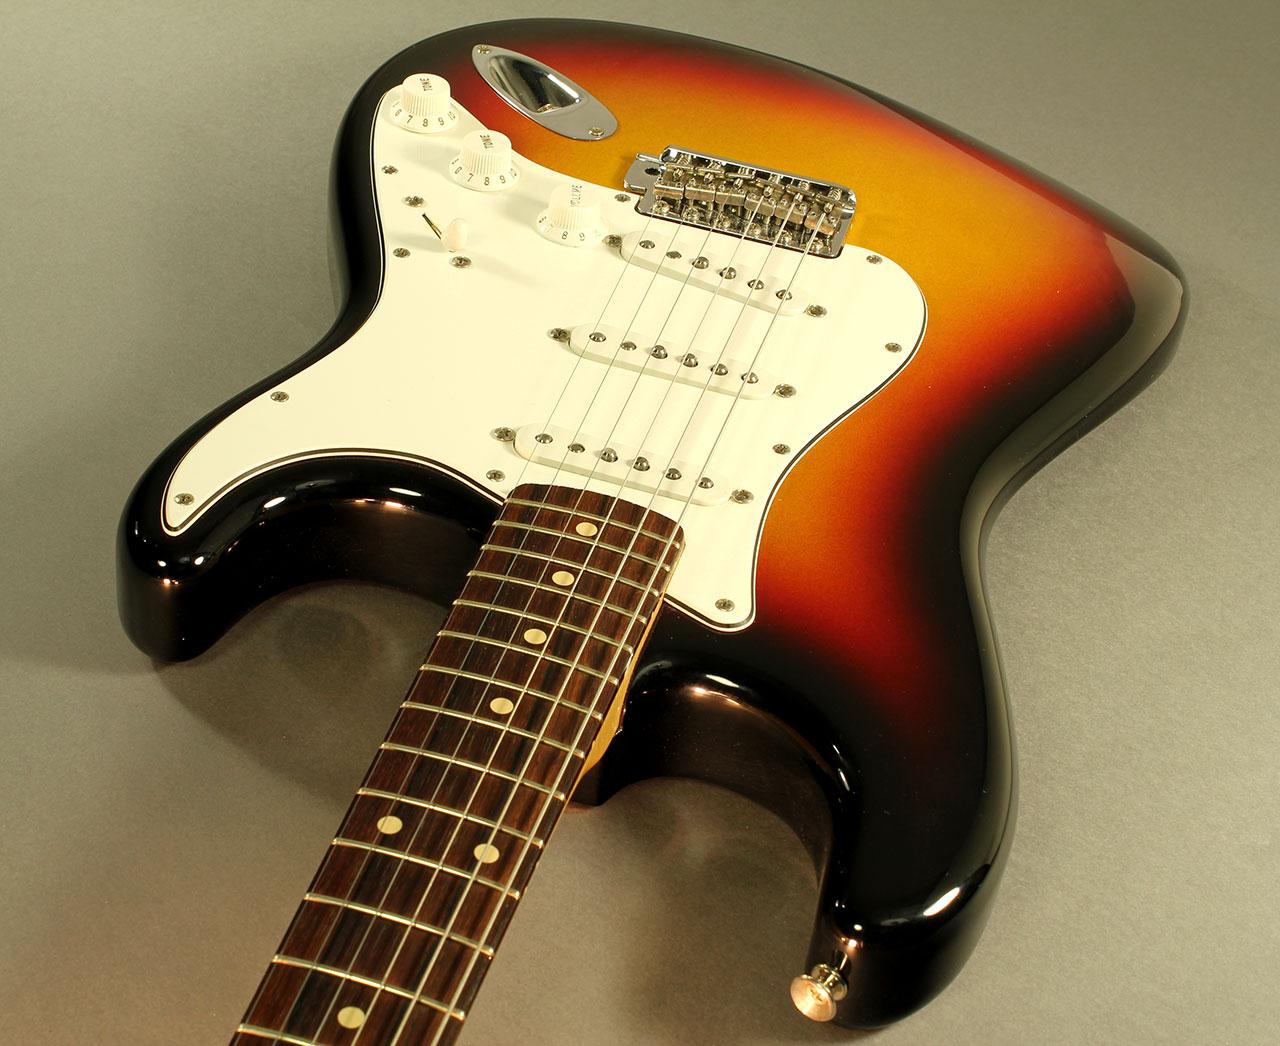 Fender-customshop-nos-1960-strat-cons-top-detail-1